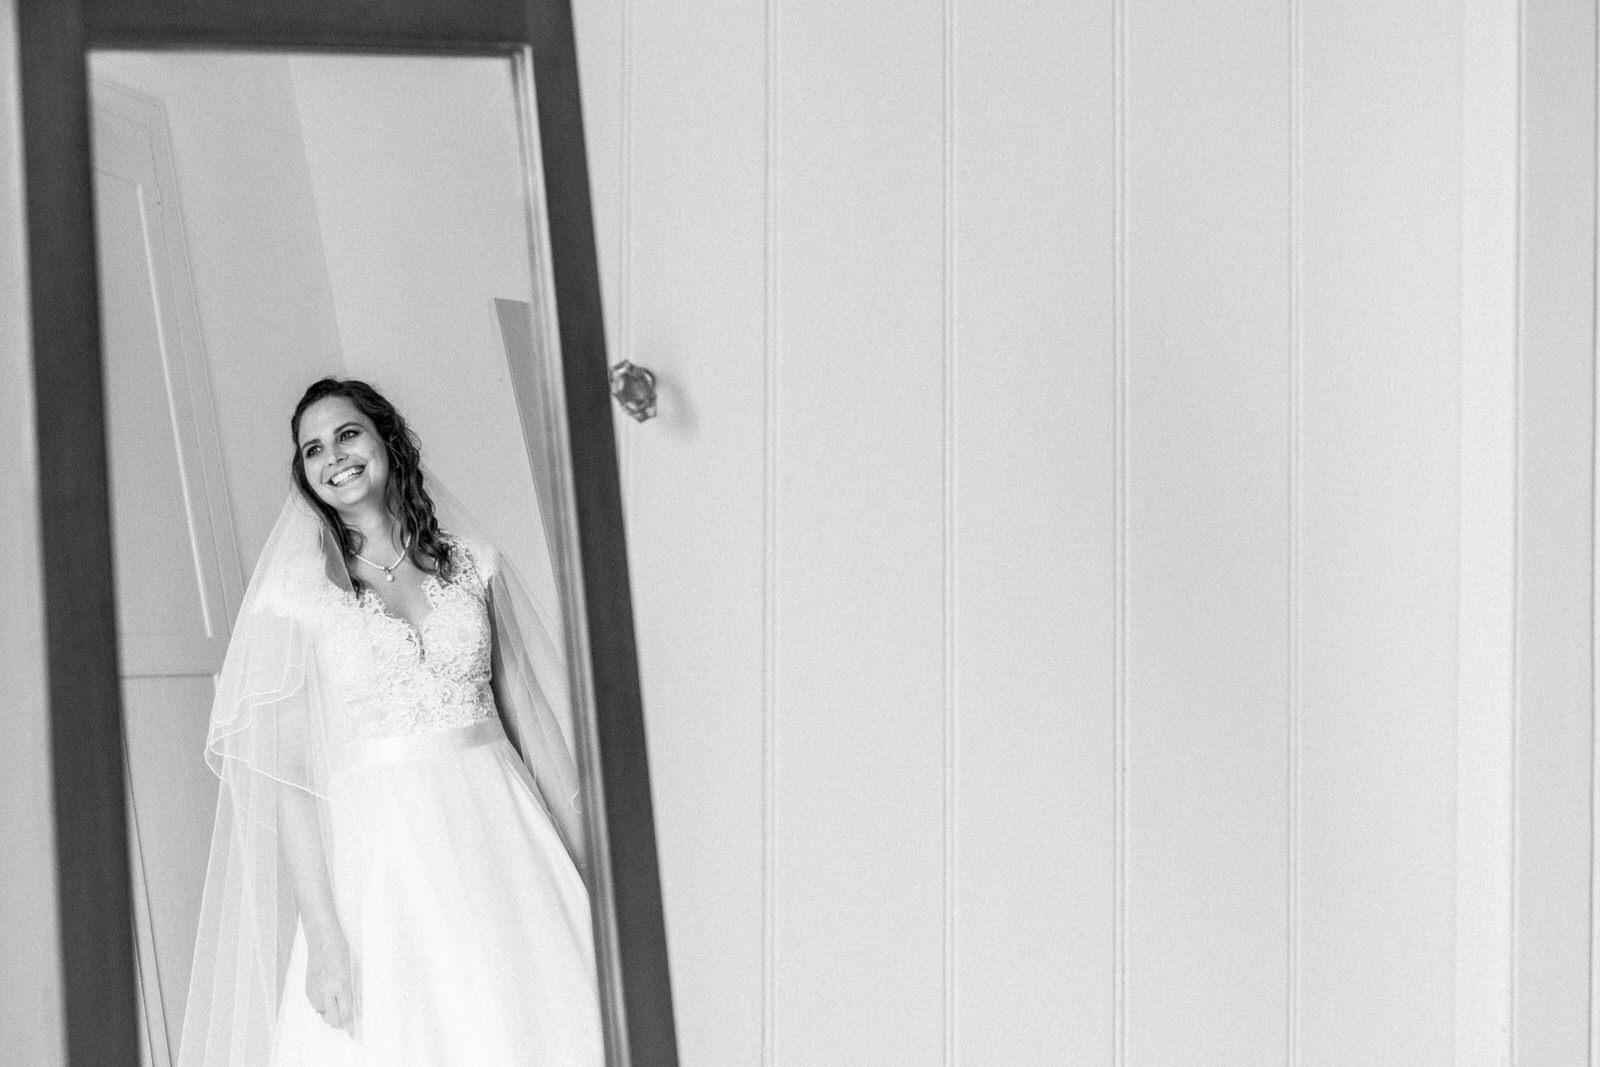 bride reflection in mirror wearing wedding dress